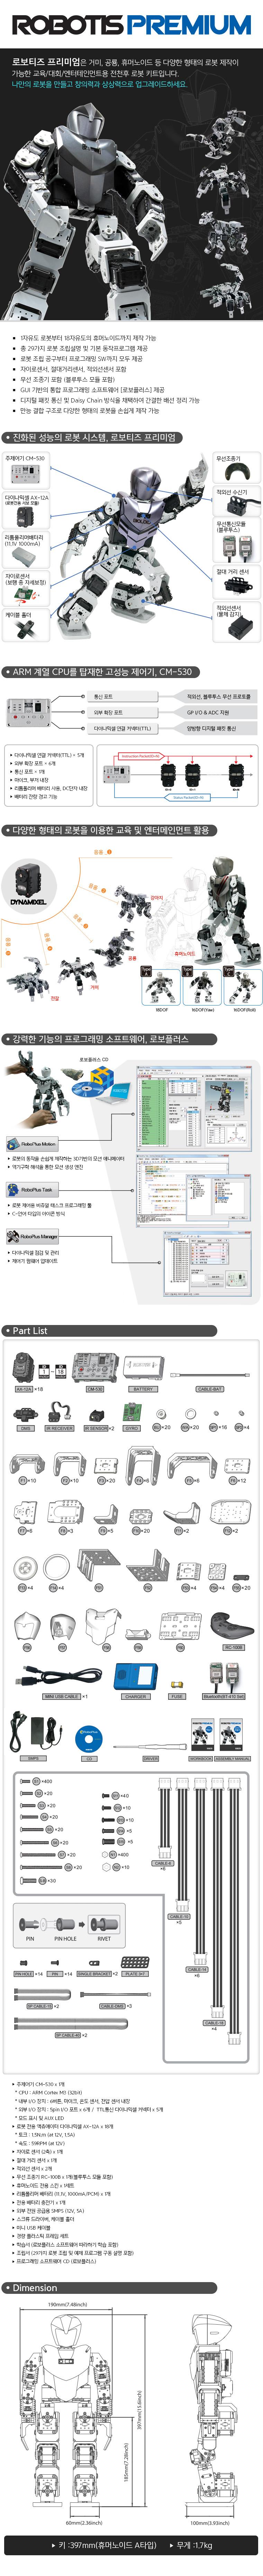 ROBOTIS_PREMIUM_KO_info_ver1642.jpg